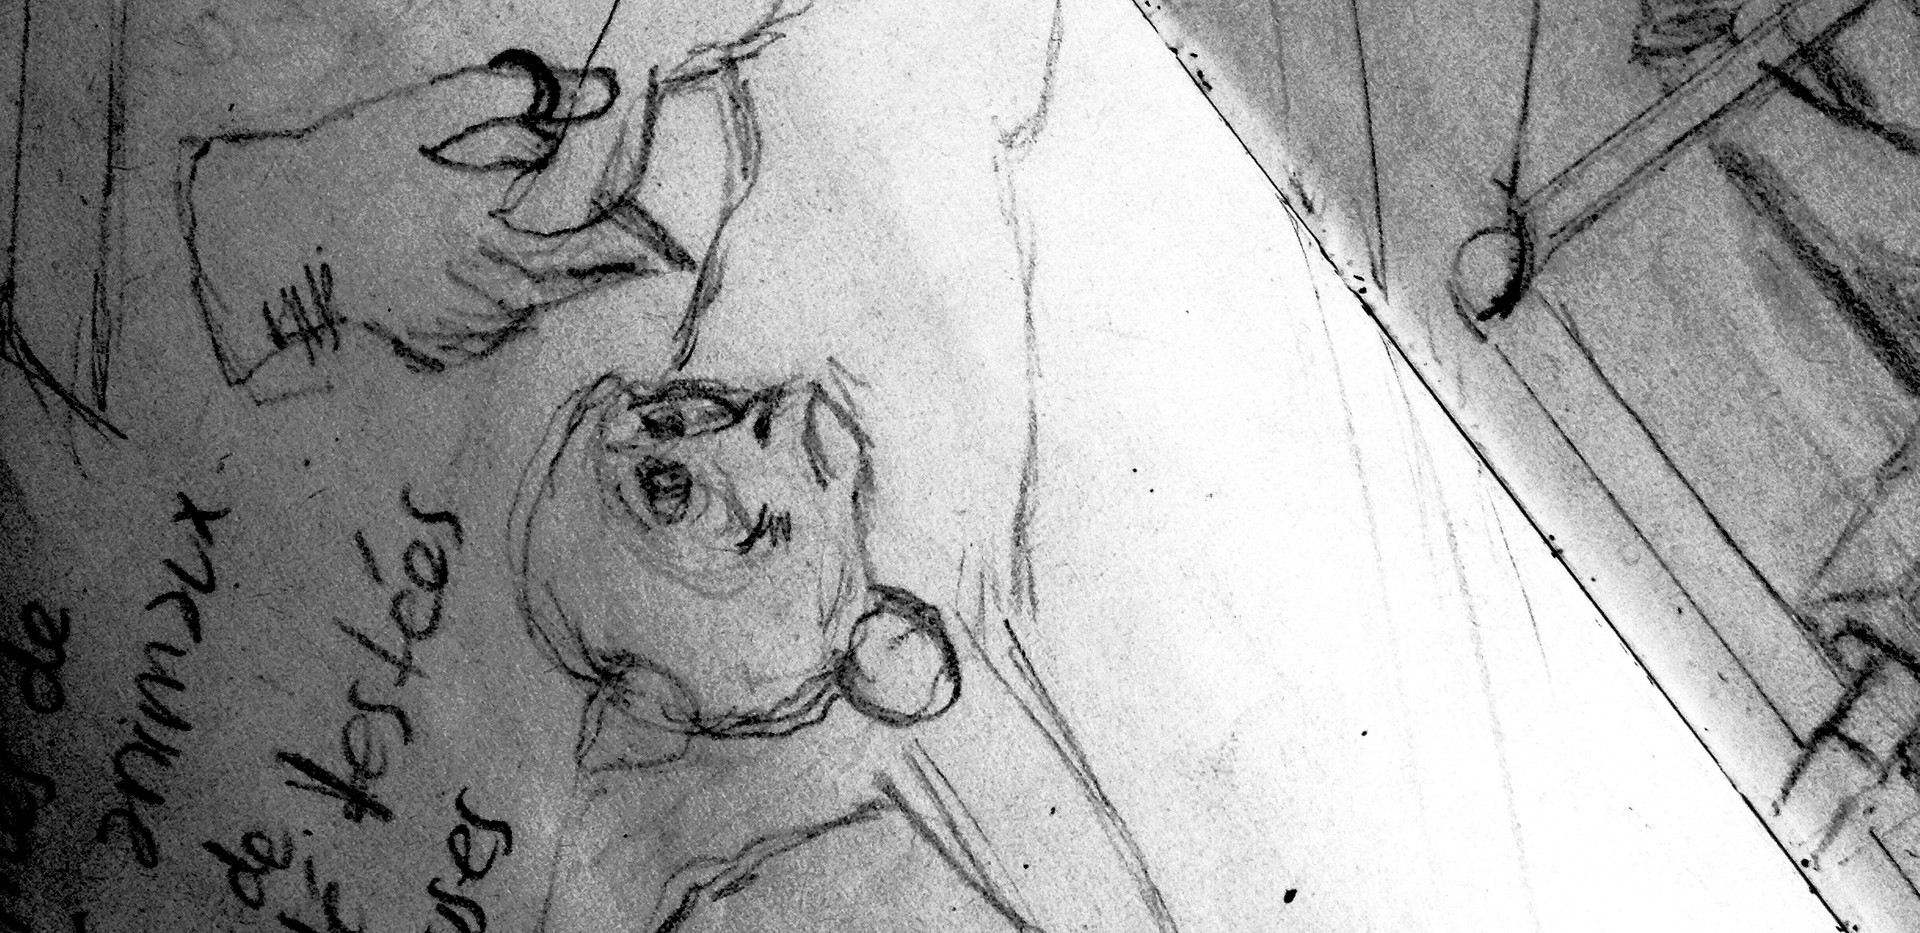 Monkeys Sketch12.jpg